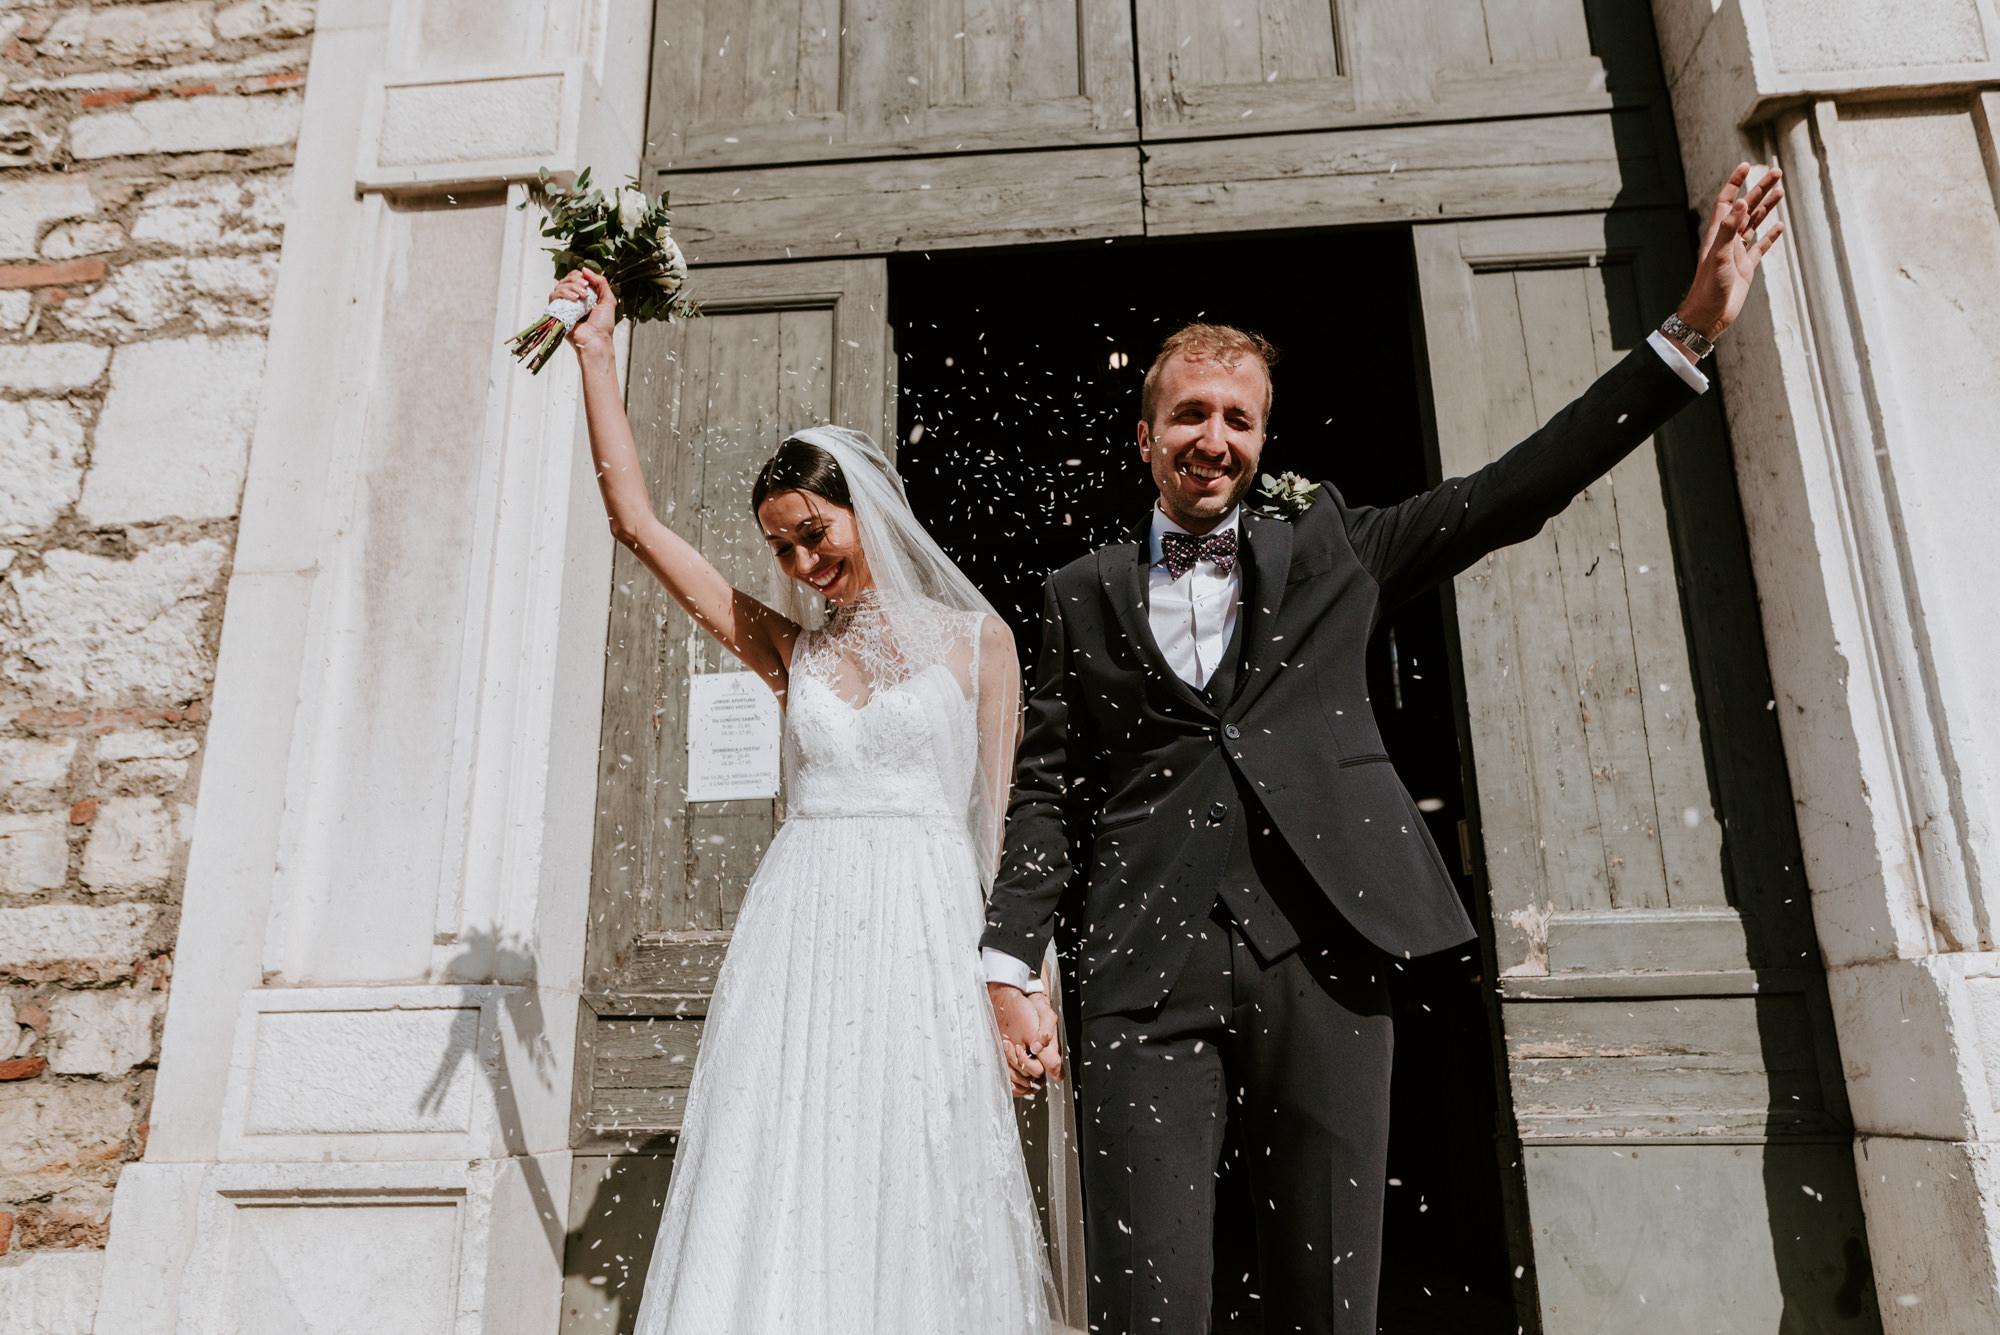 FOTO+PHOTO+BODA+WEDDING+ITALIA+ITALY+MAURICIO+GARAY+MAURICIOGARAY+WEDDINPHOTOGRAPHER+FOTOGRAFODEBODA-1054.jpg